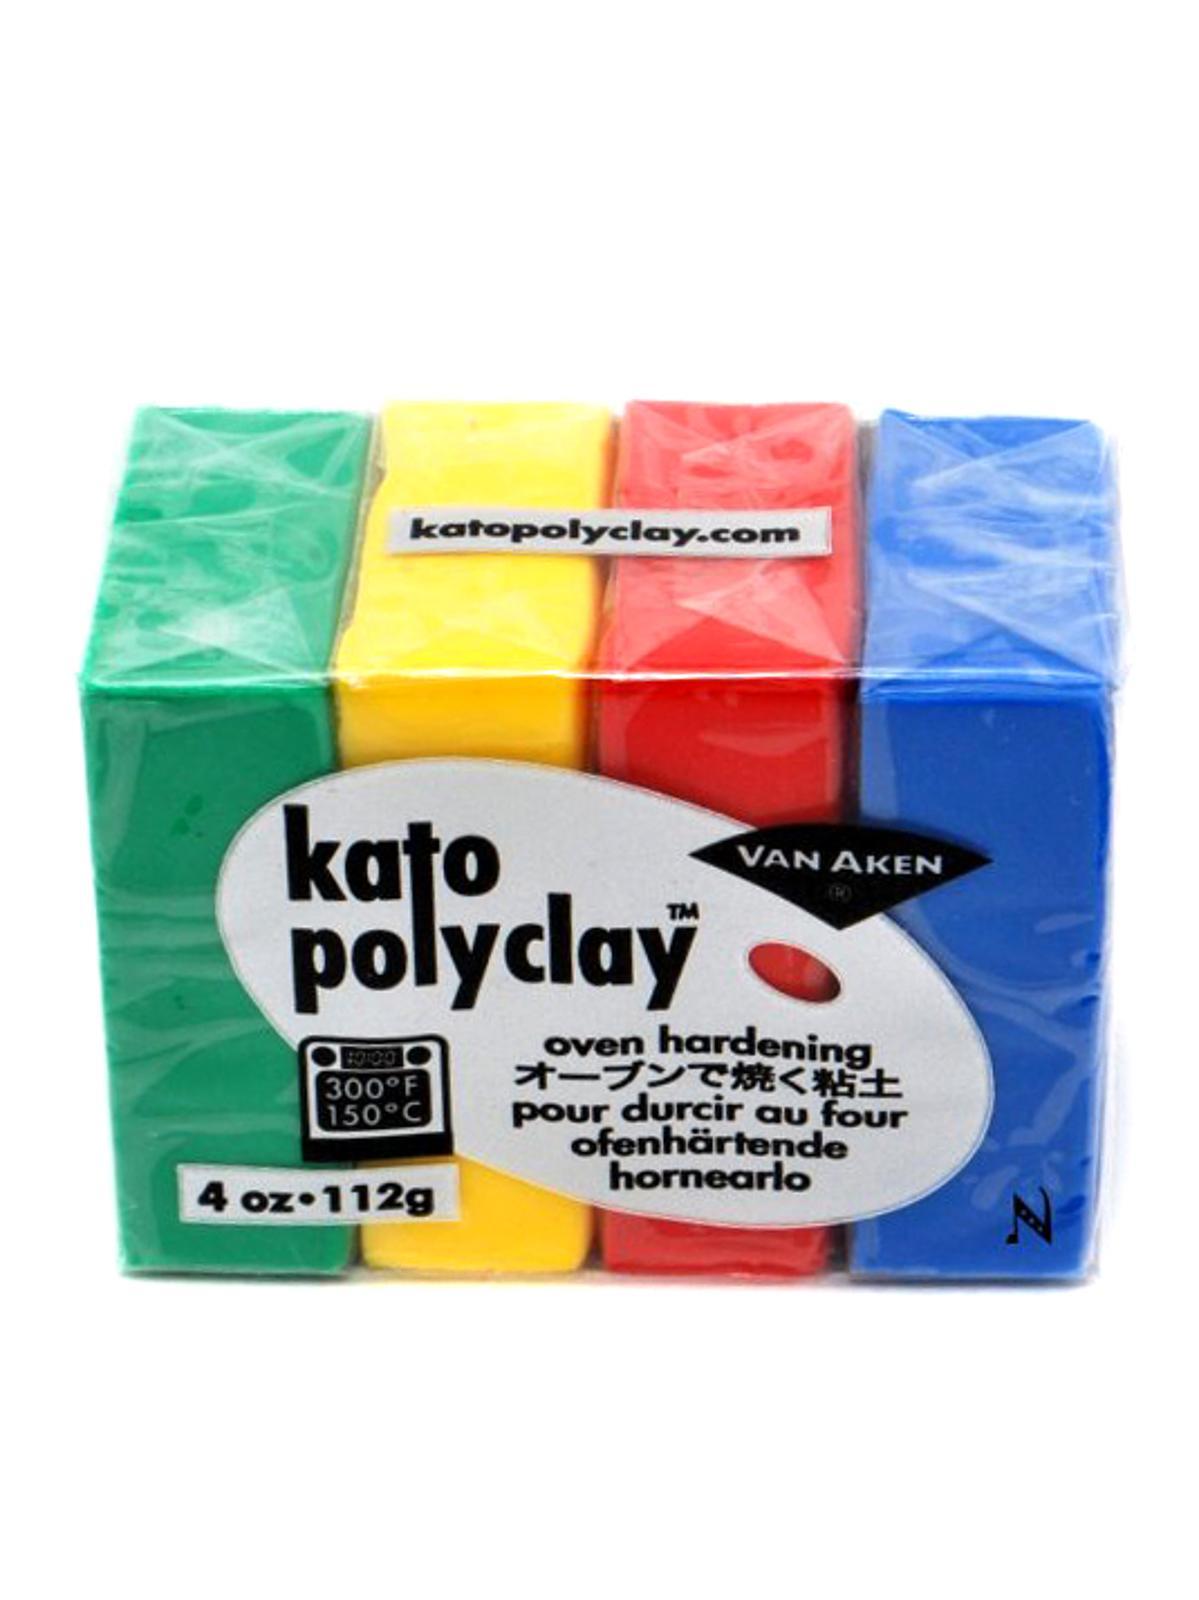 Kato Polyclay Sets